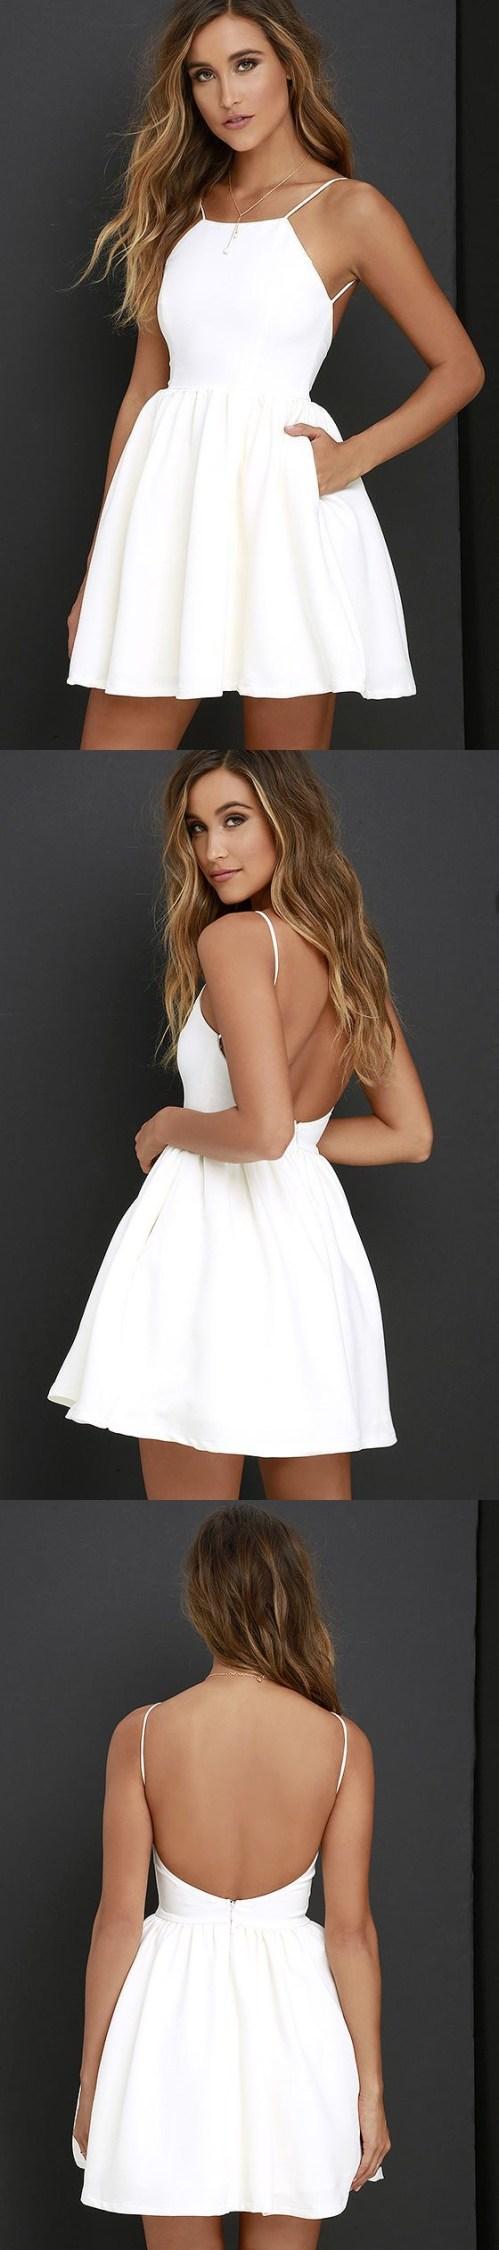 Medium Of Simple White Dress